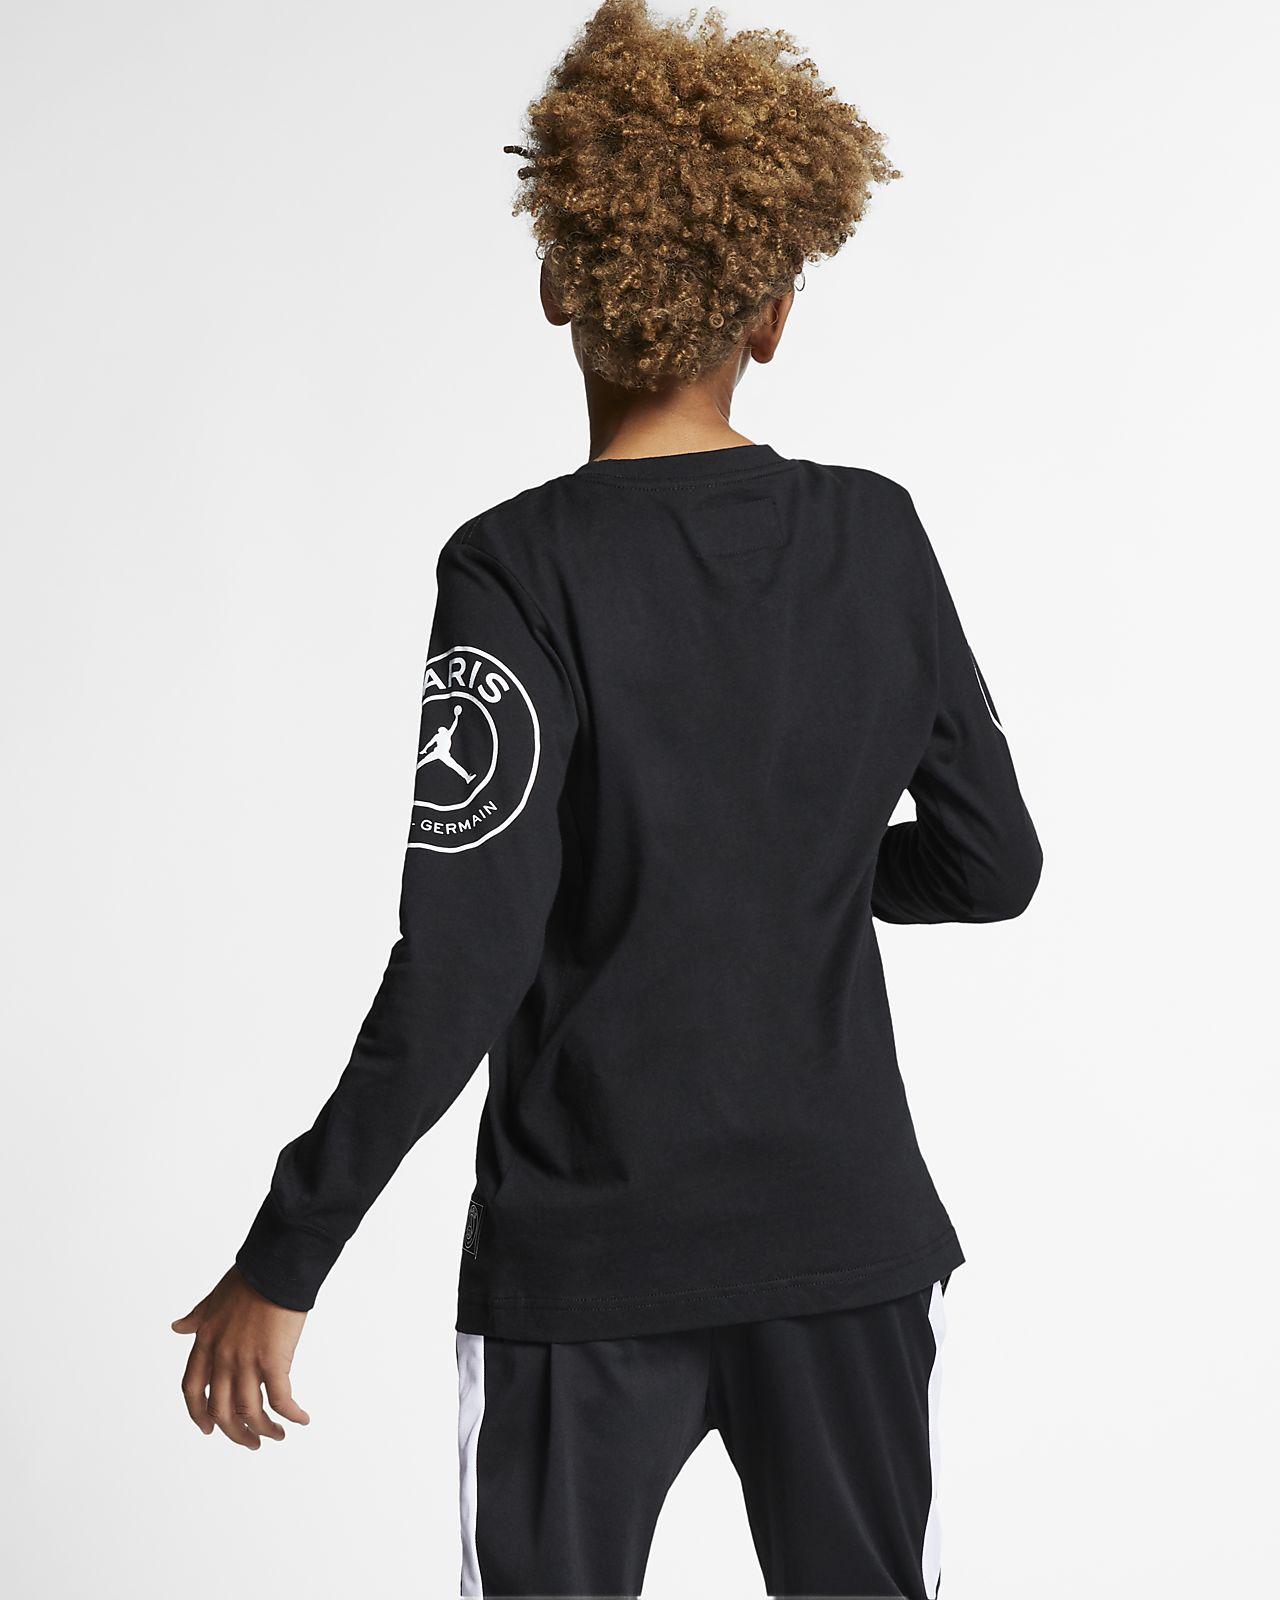 feec058e PSG Older Kids' (Boys') Long-Sleeve T-Shirt. Nike.com GB